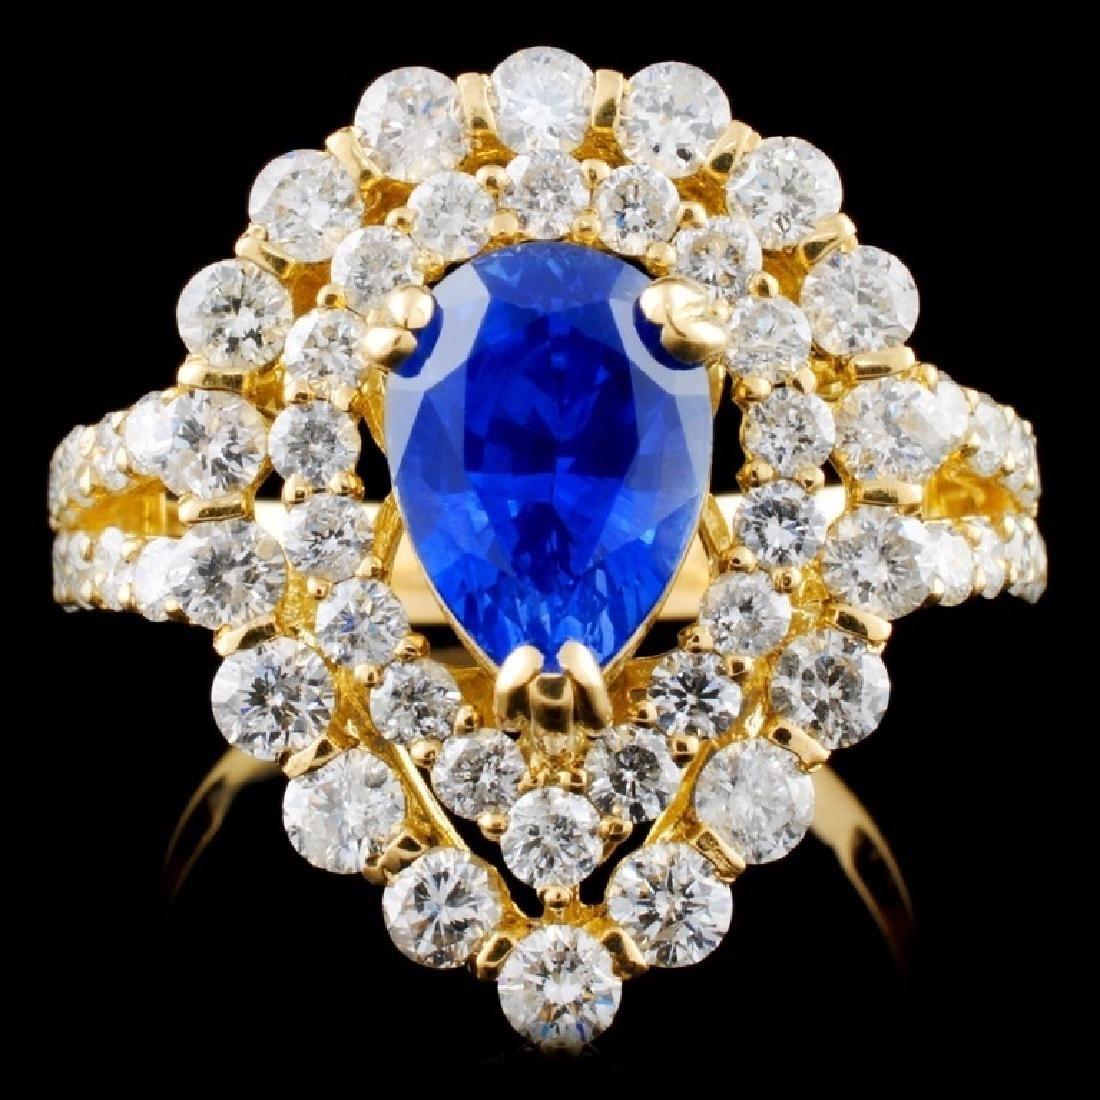 18K Y Gold 2.18ct Sapphire & 1.91ct Diamond Ring